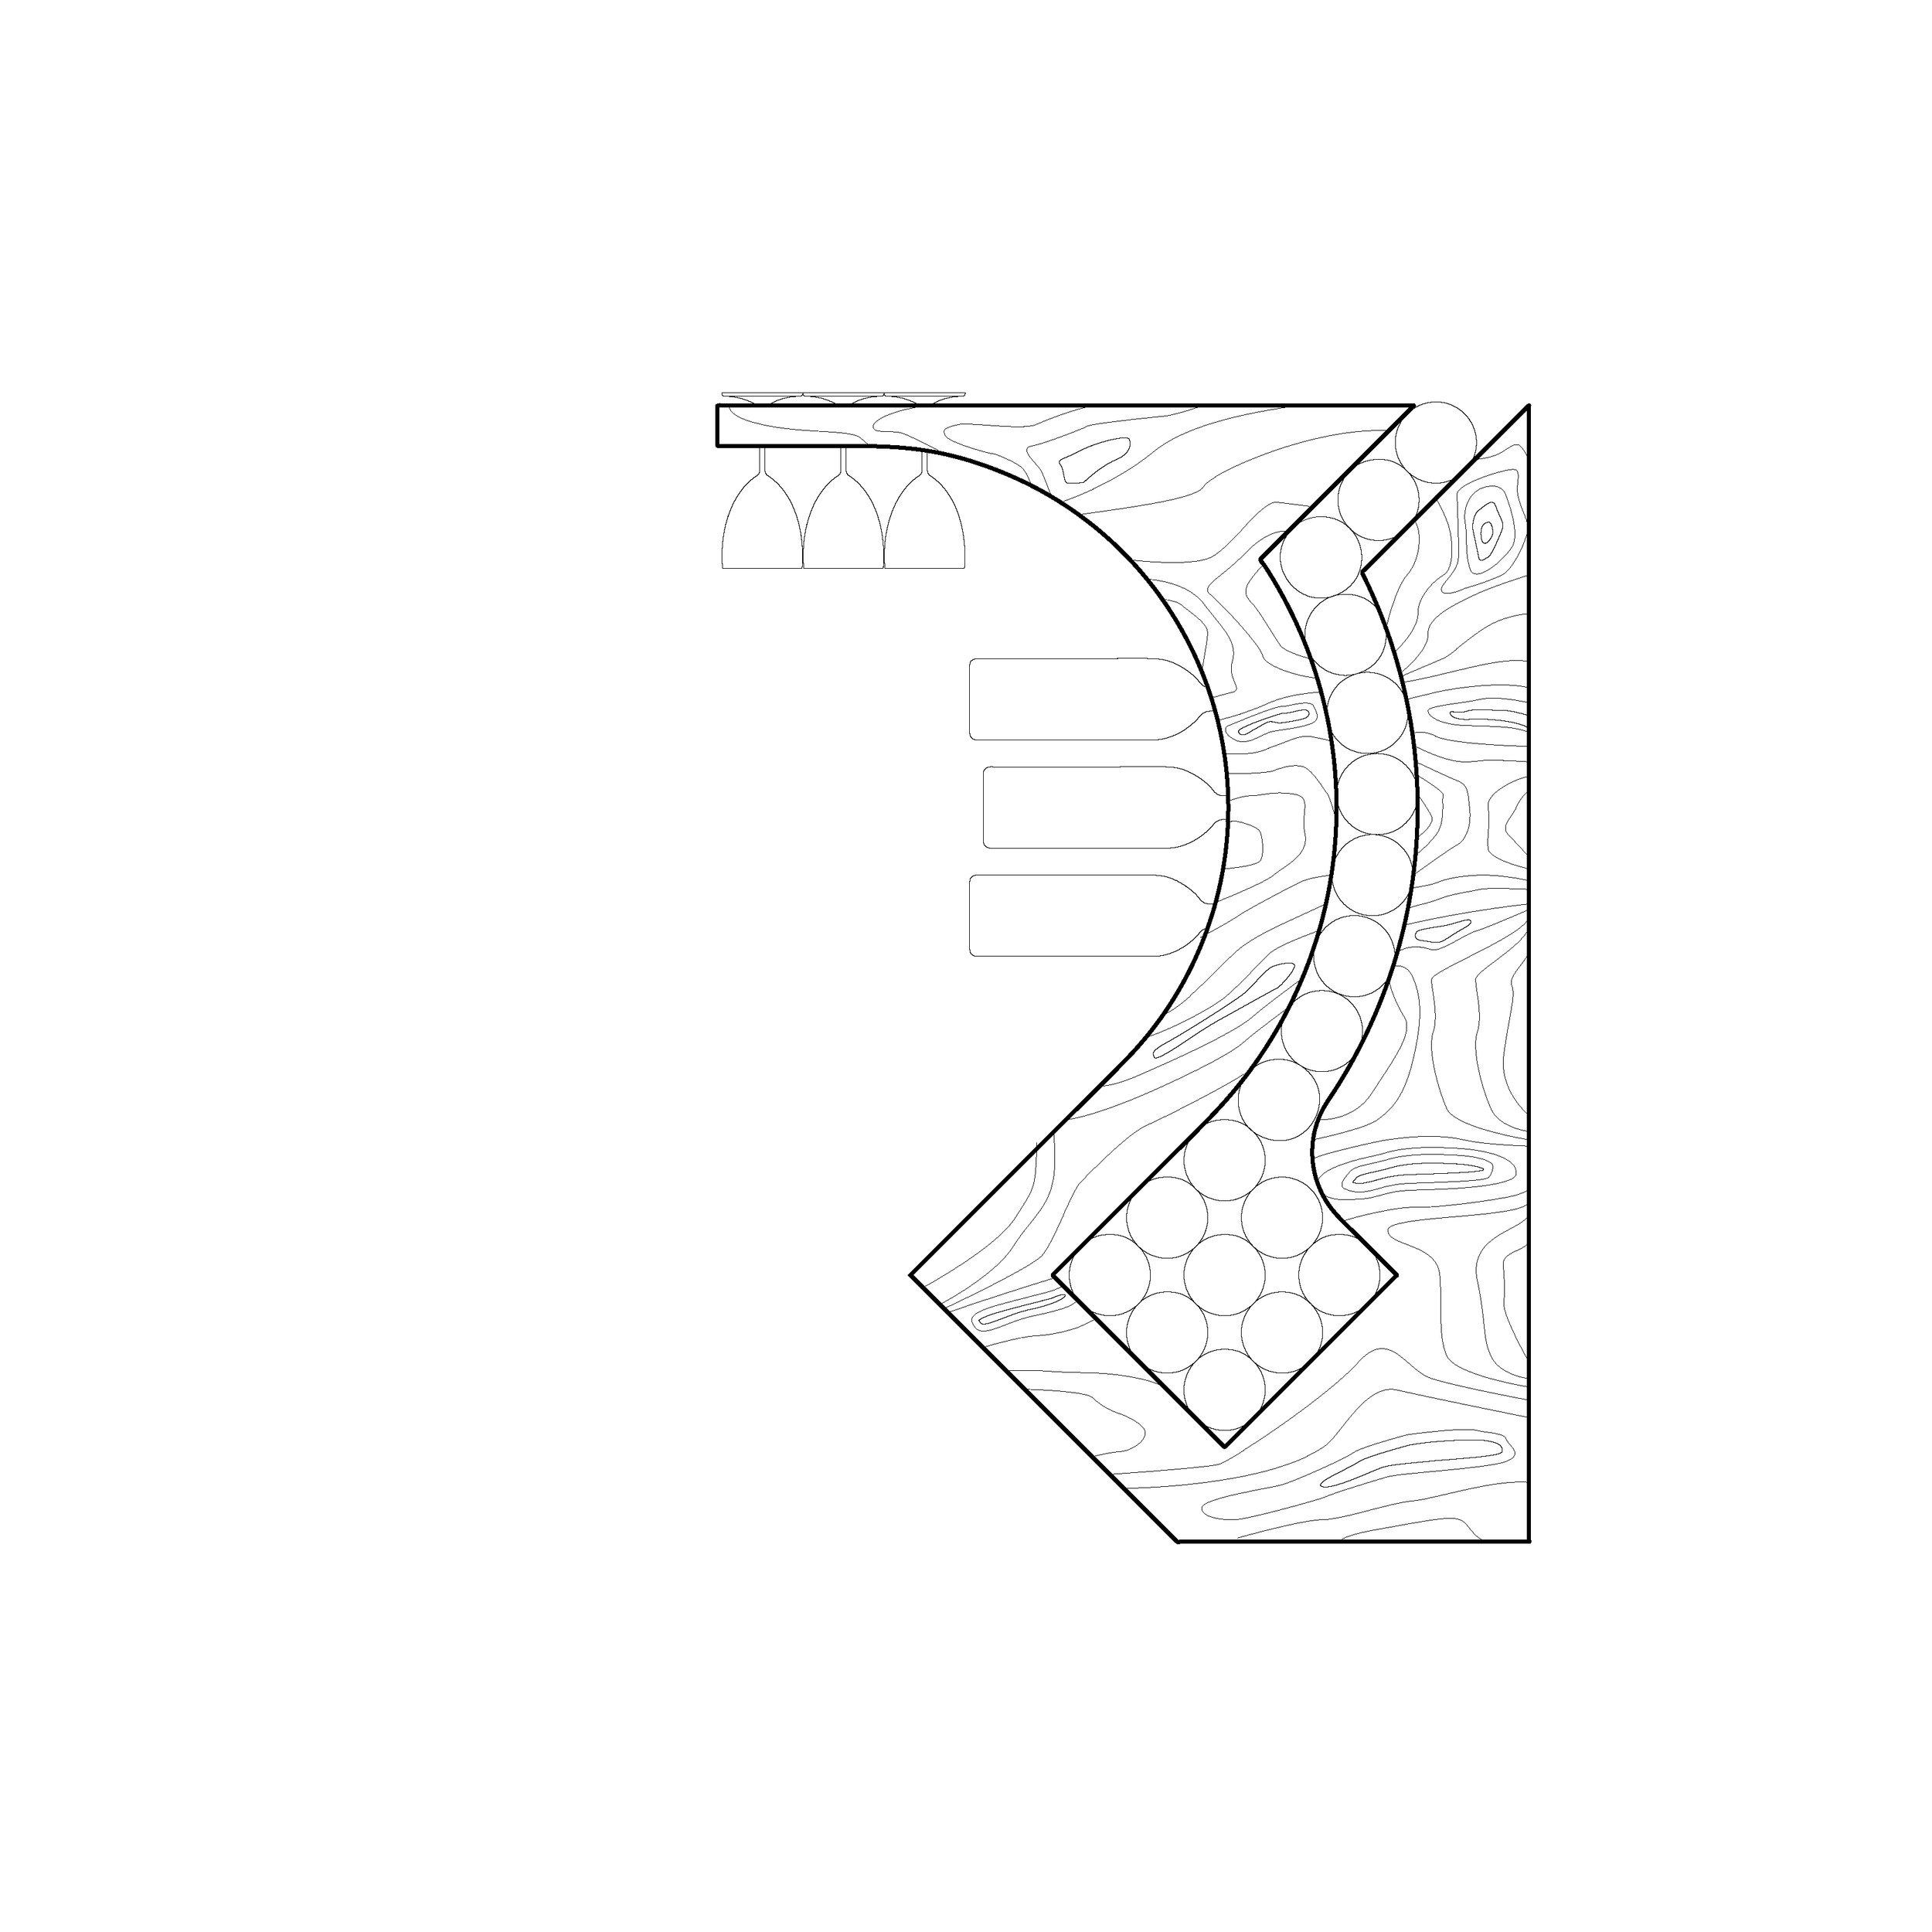 Linework Icons Squares - Furniture-Contours-03.jpg